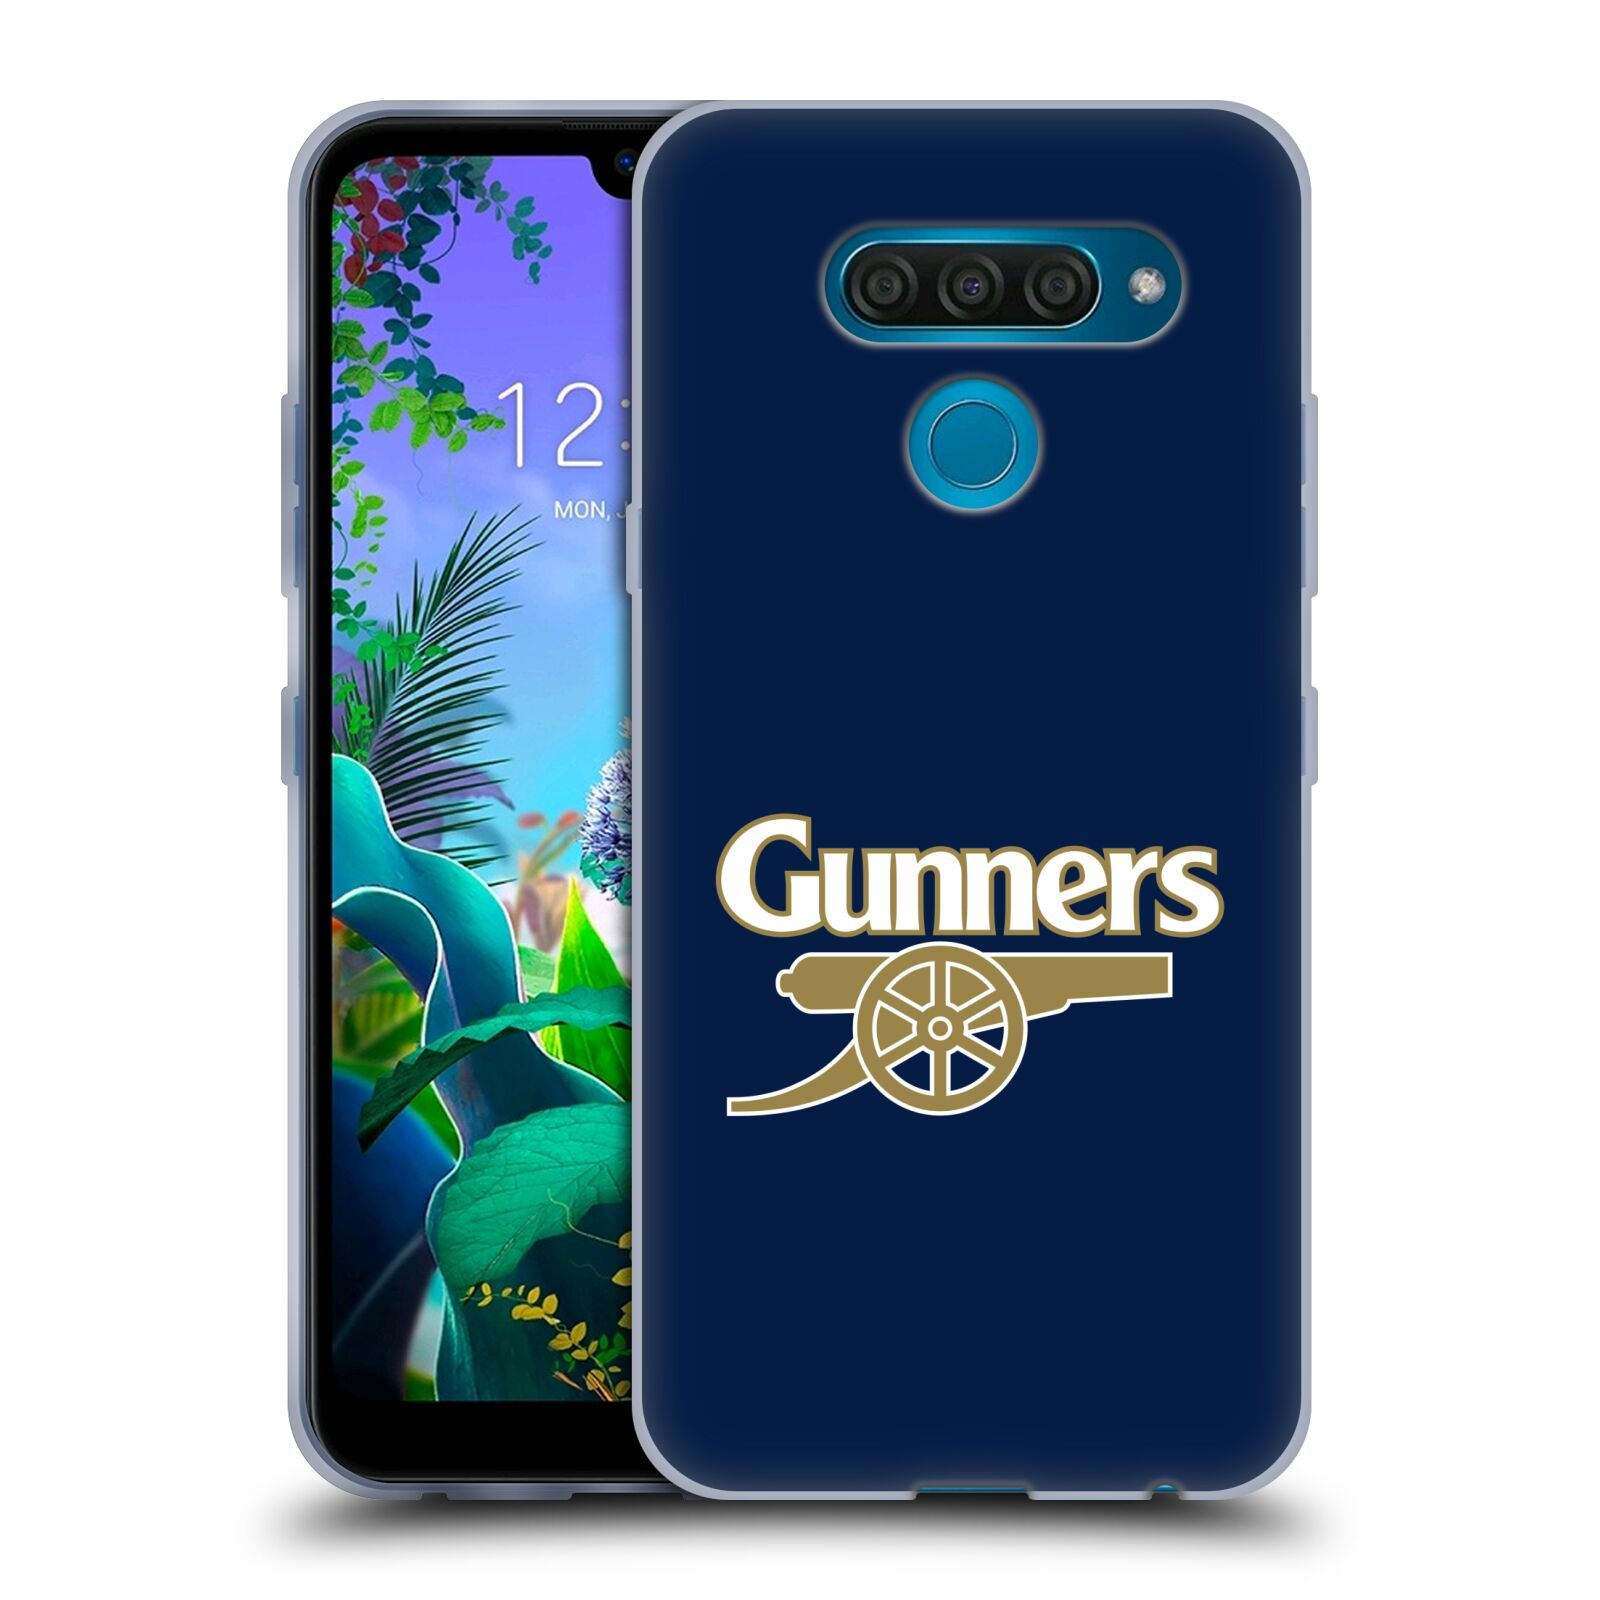 Silikonové pouzdro na mobil LG Q60 - Head Case - Arsenal FC - Gunners